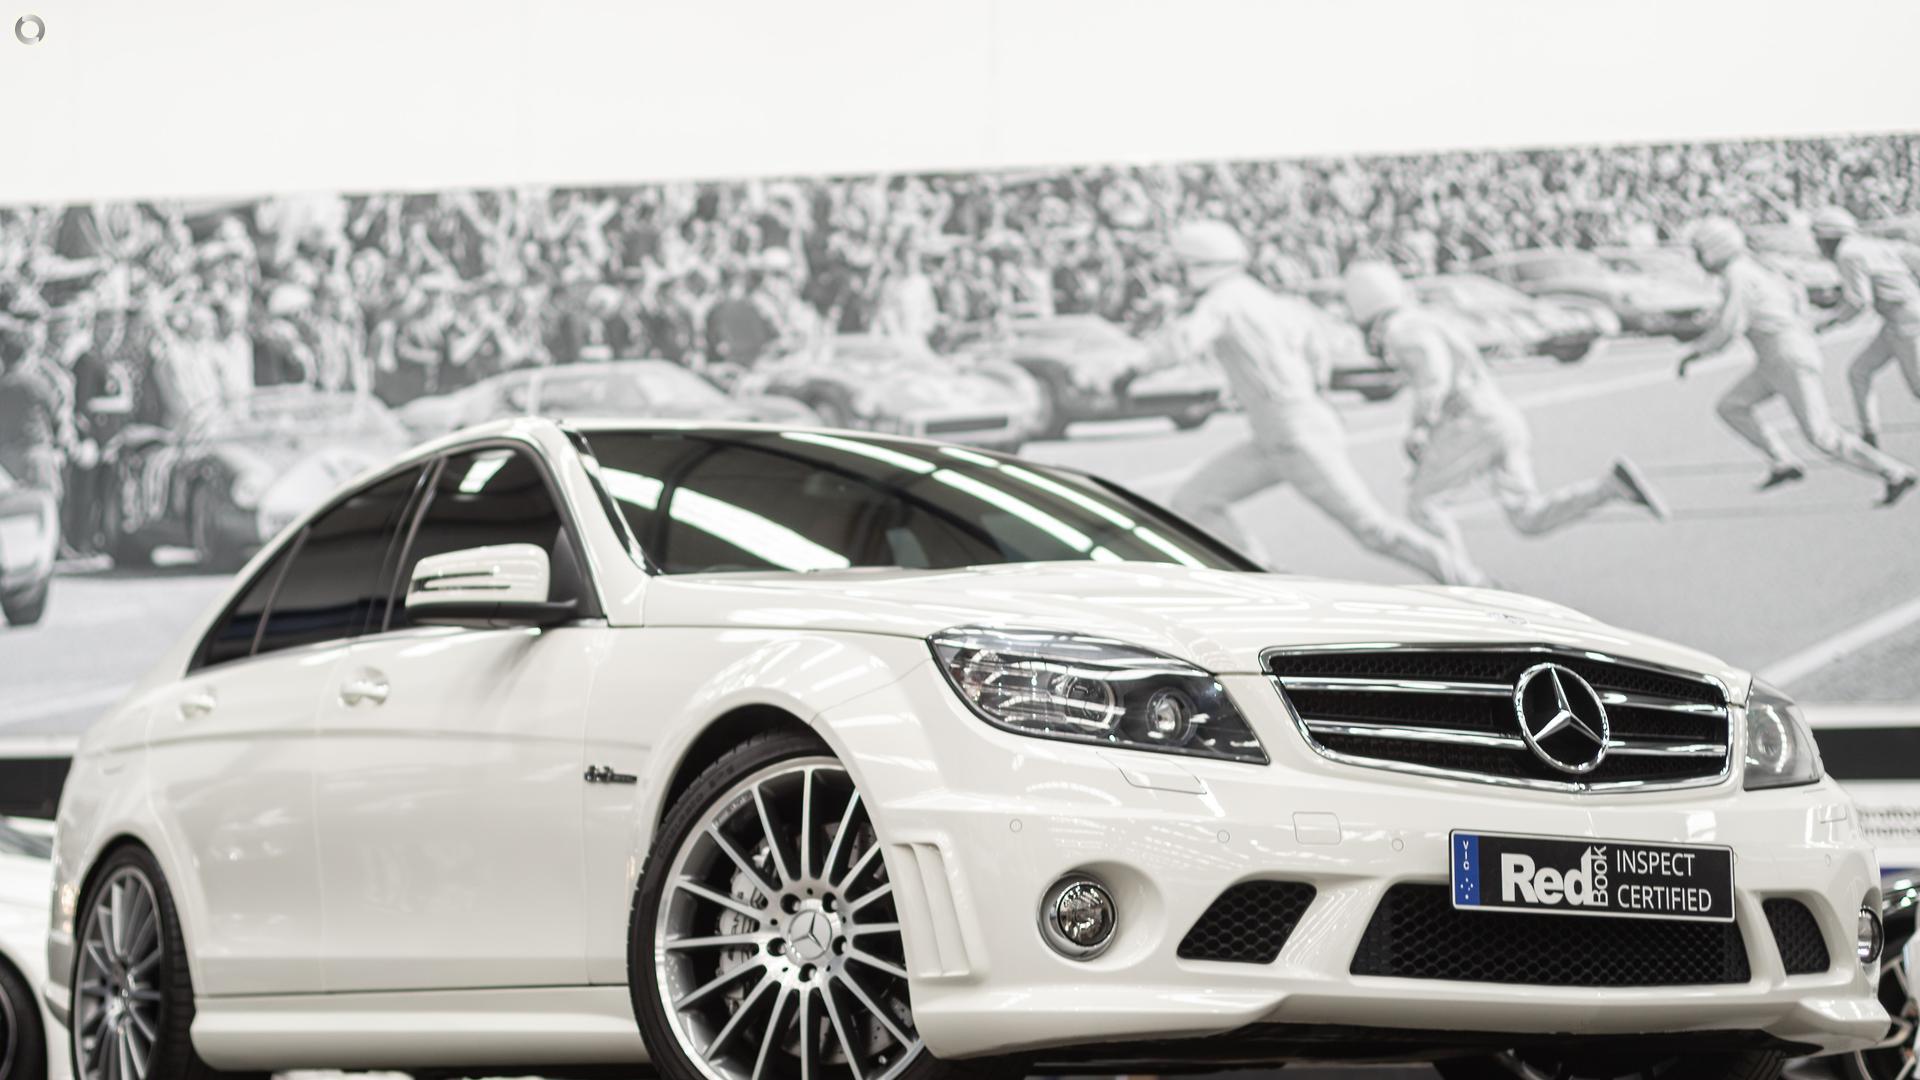 2011 Mercedes-Benz C-Class W204